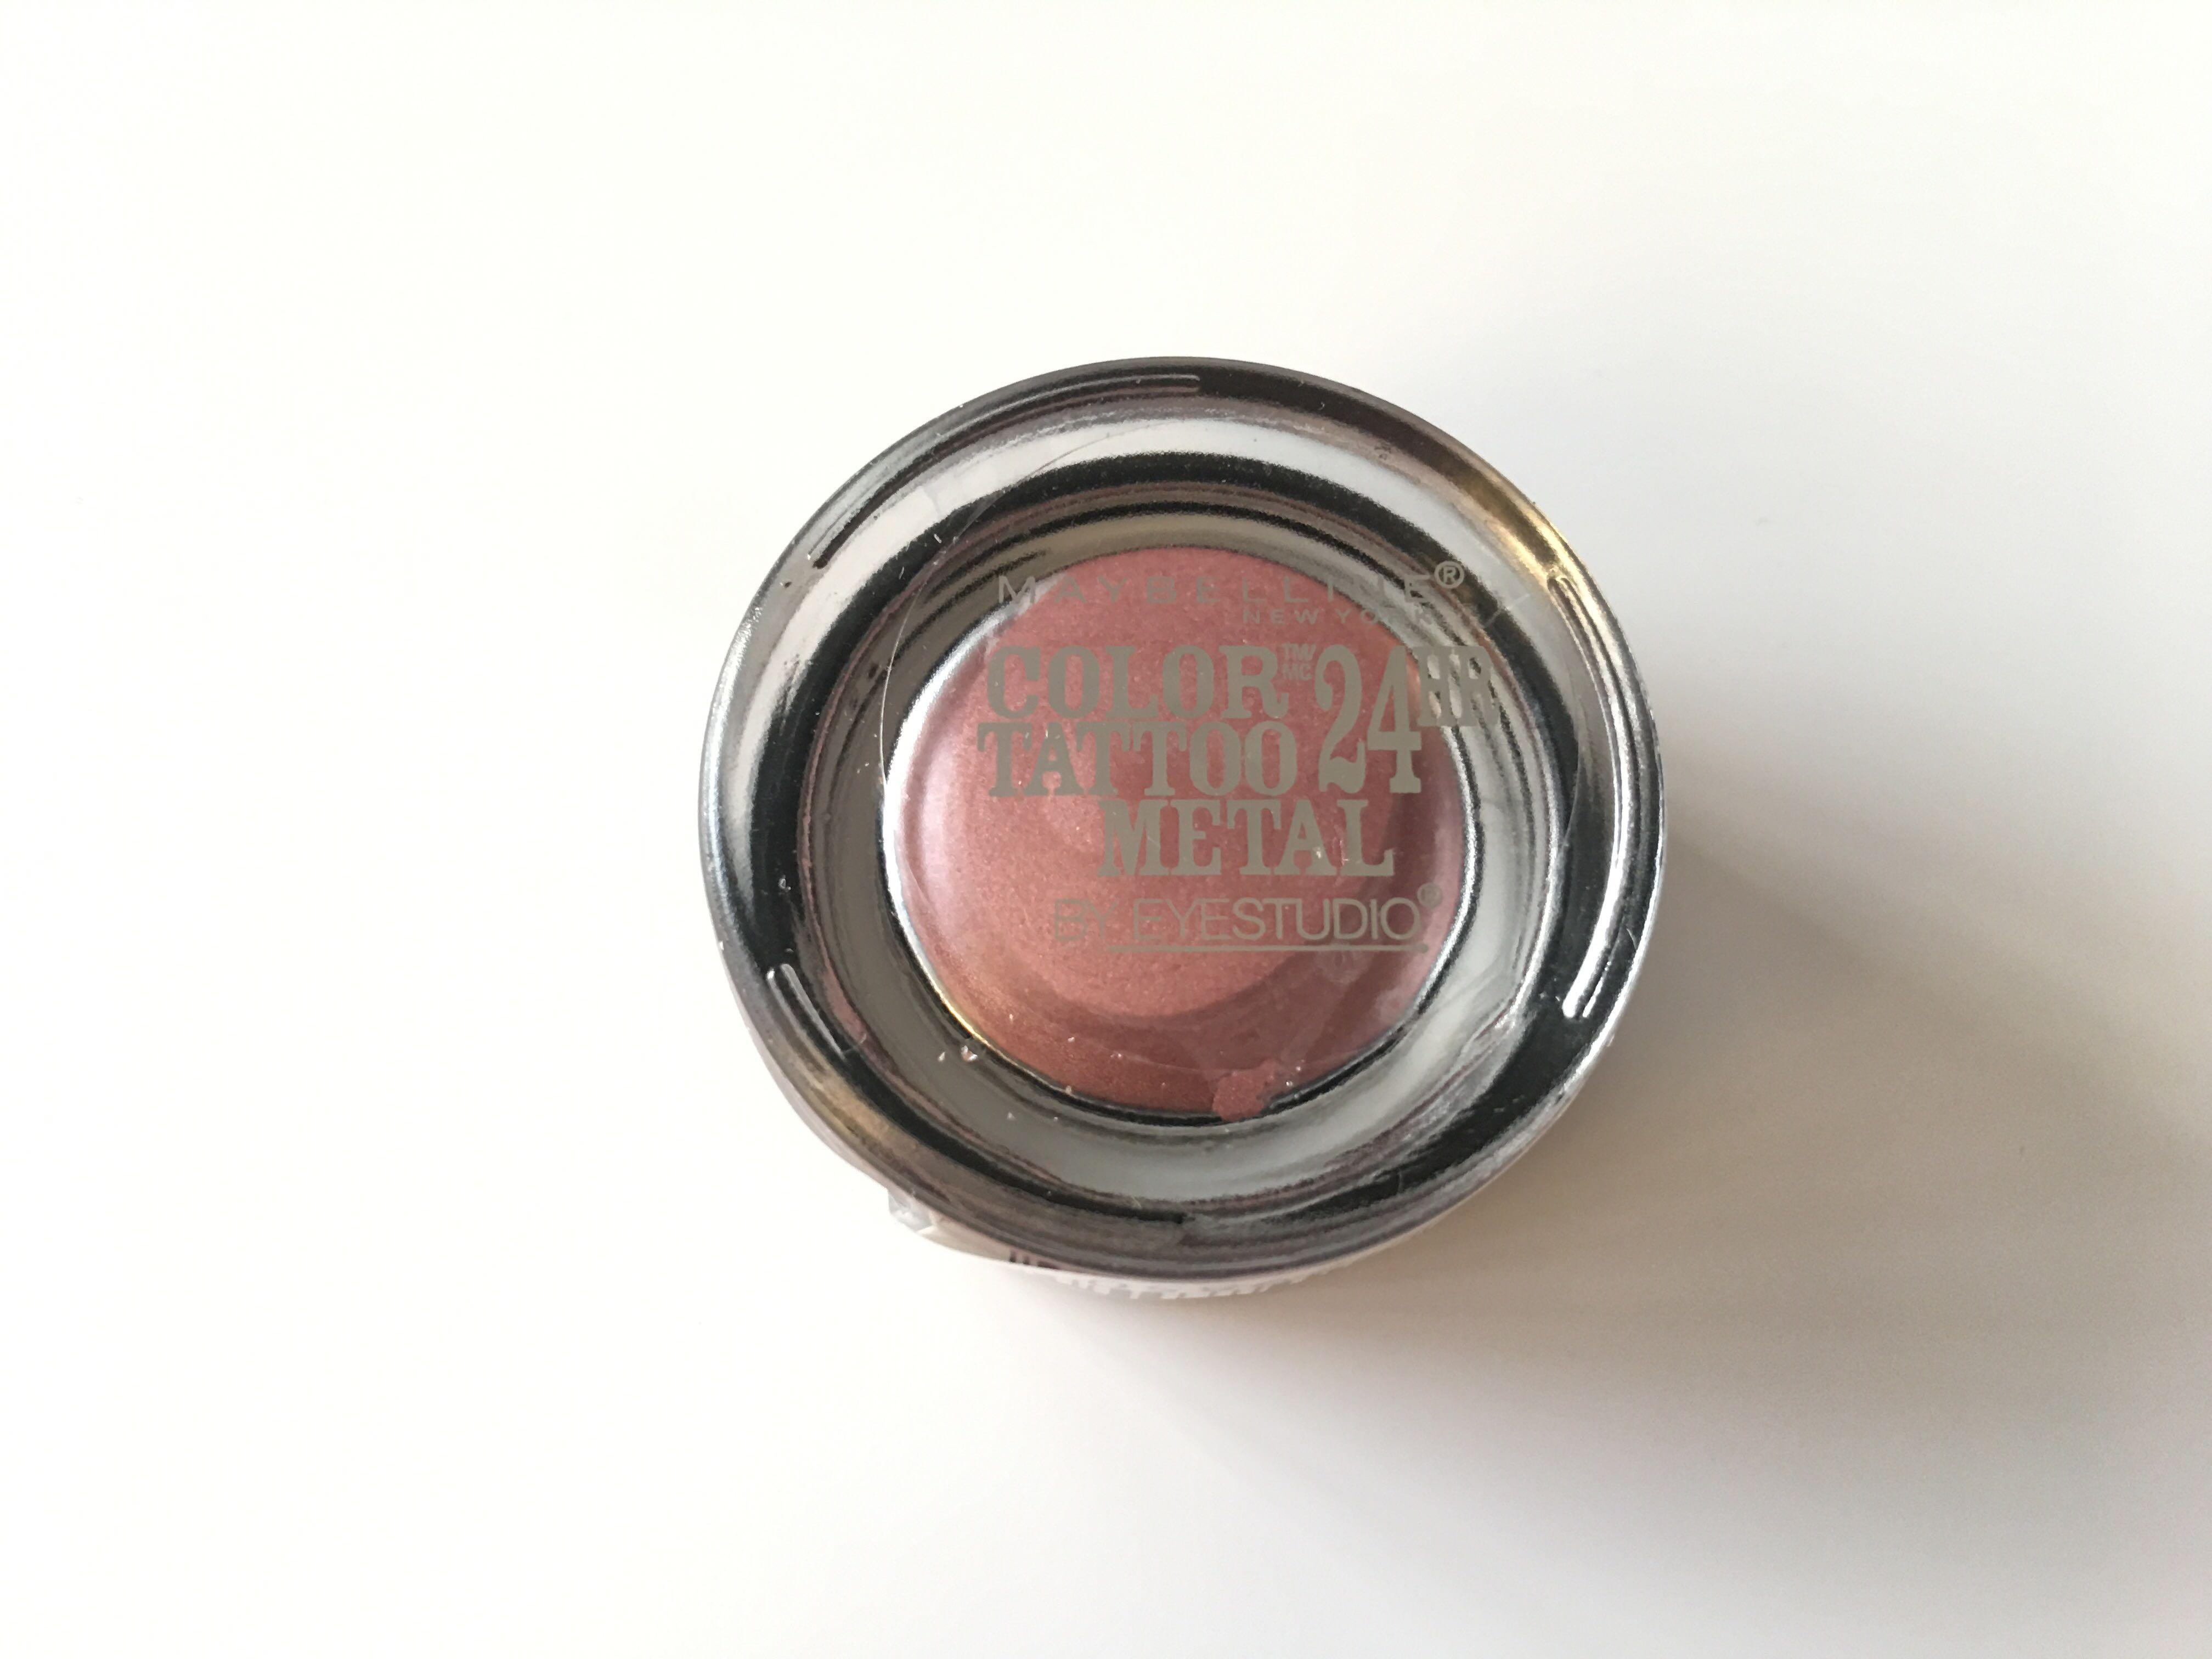 Maybelline New York Color Tattoo Metal 24h Eyeshadow #55 Inked In Pink